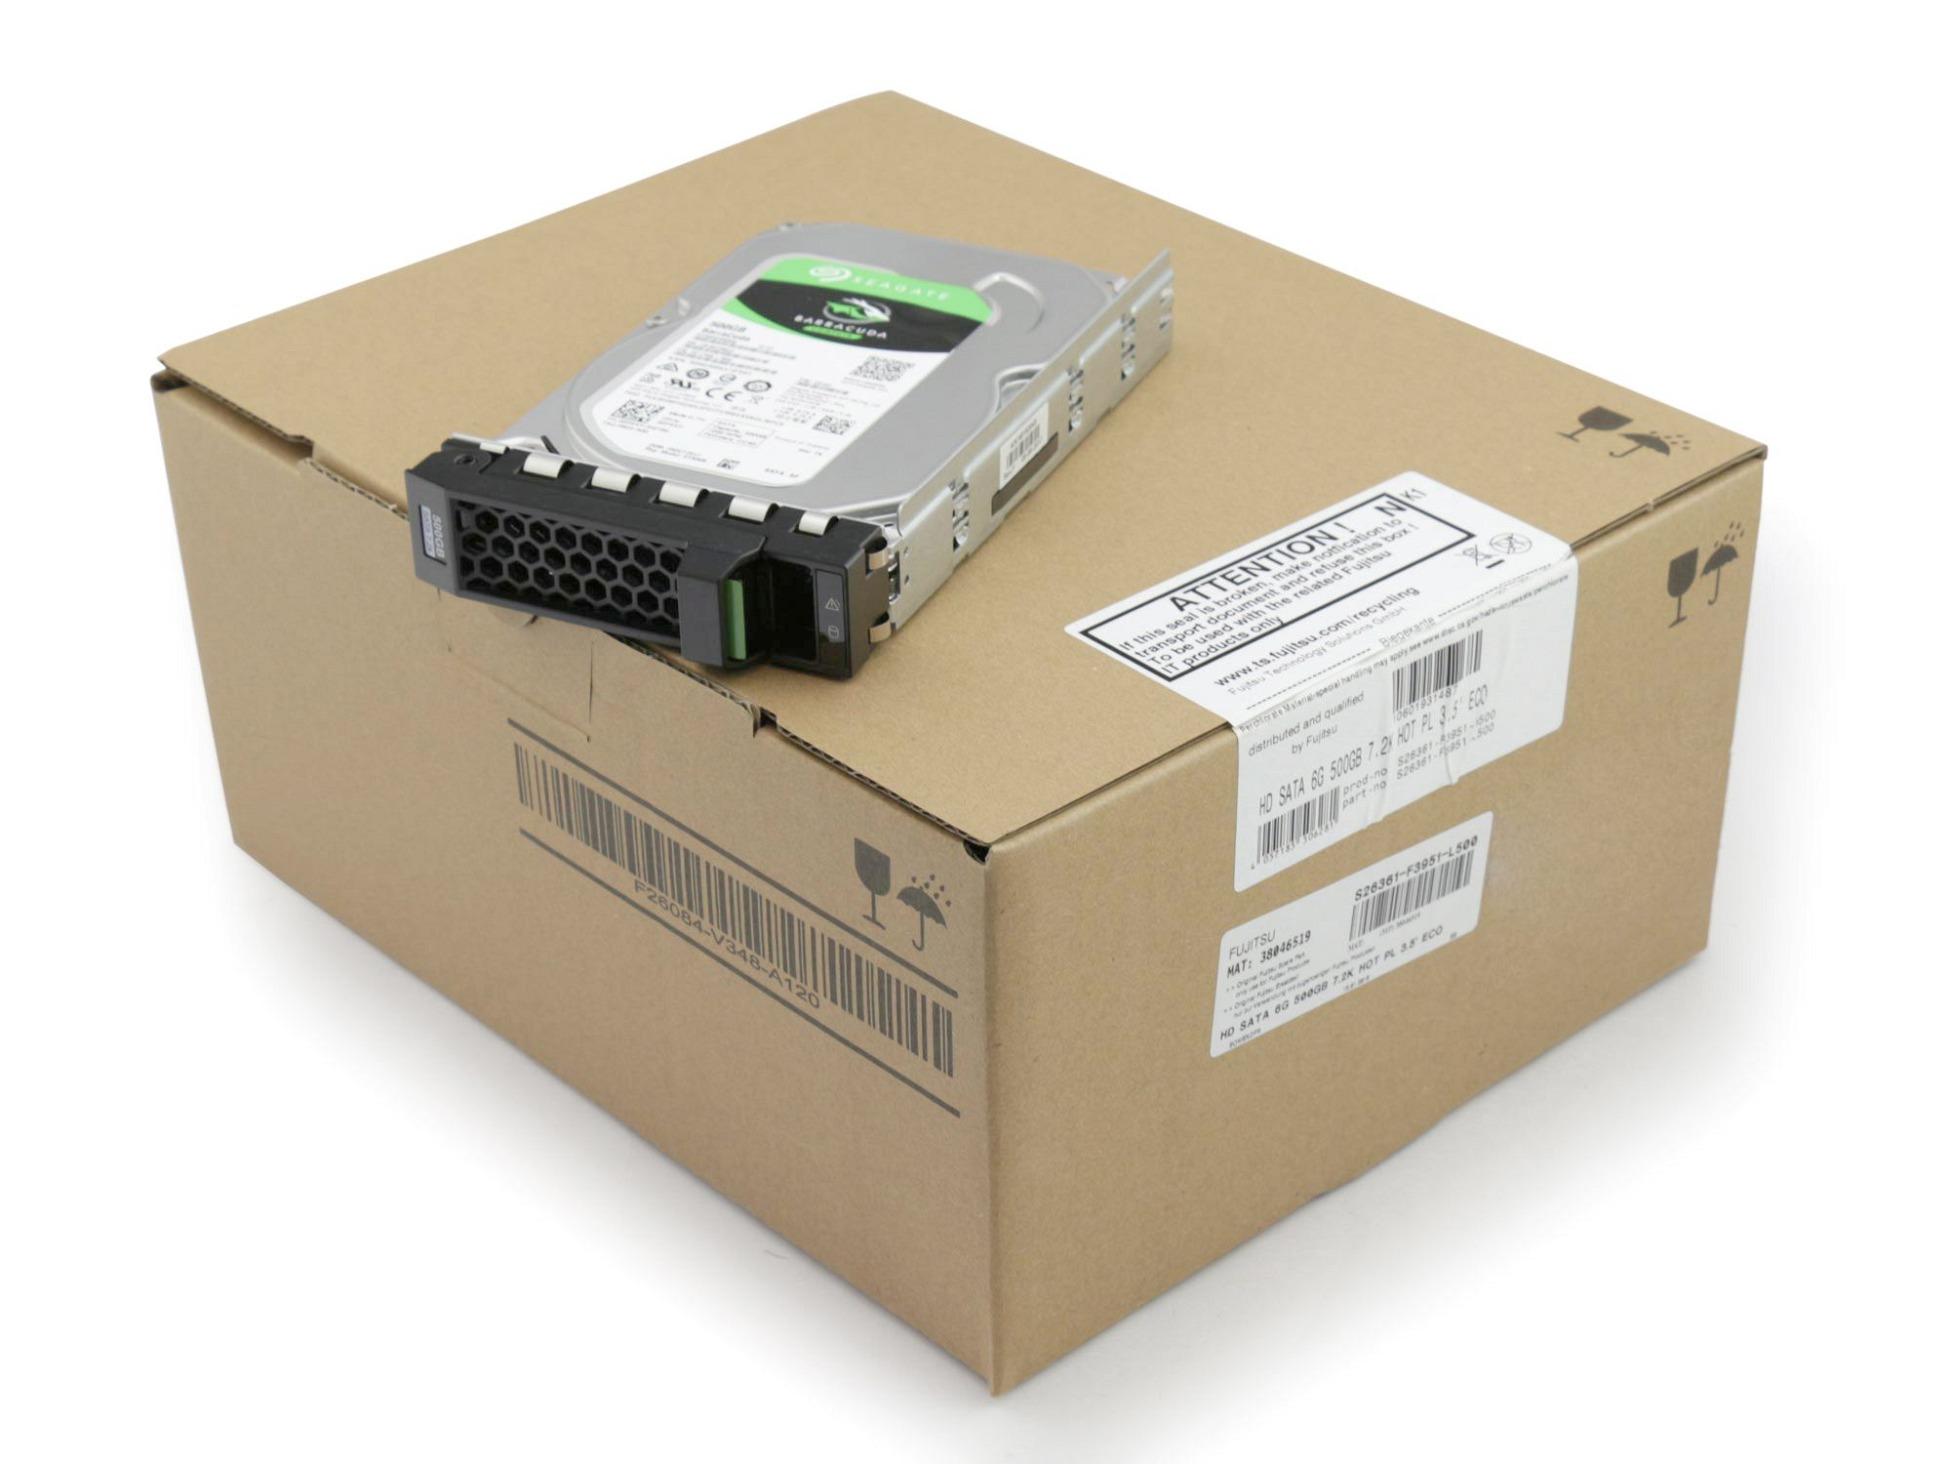 SRV48F Server Festplatte HDD 500GB (3,5 Zoll / 8,9 cm) S-ATA III (6,0 Gb/s) ECO 7.2K inkl. Hot-Plug